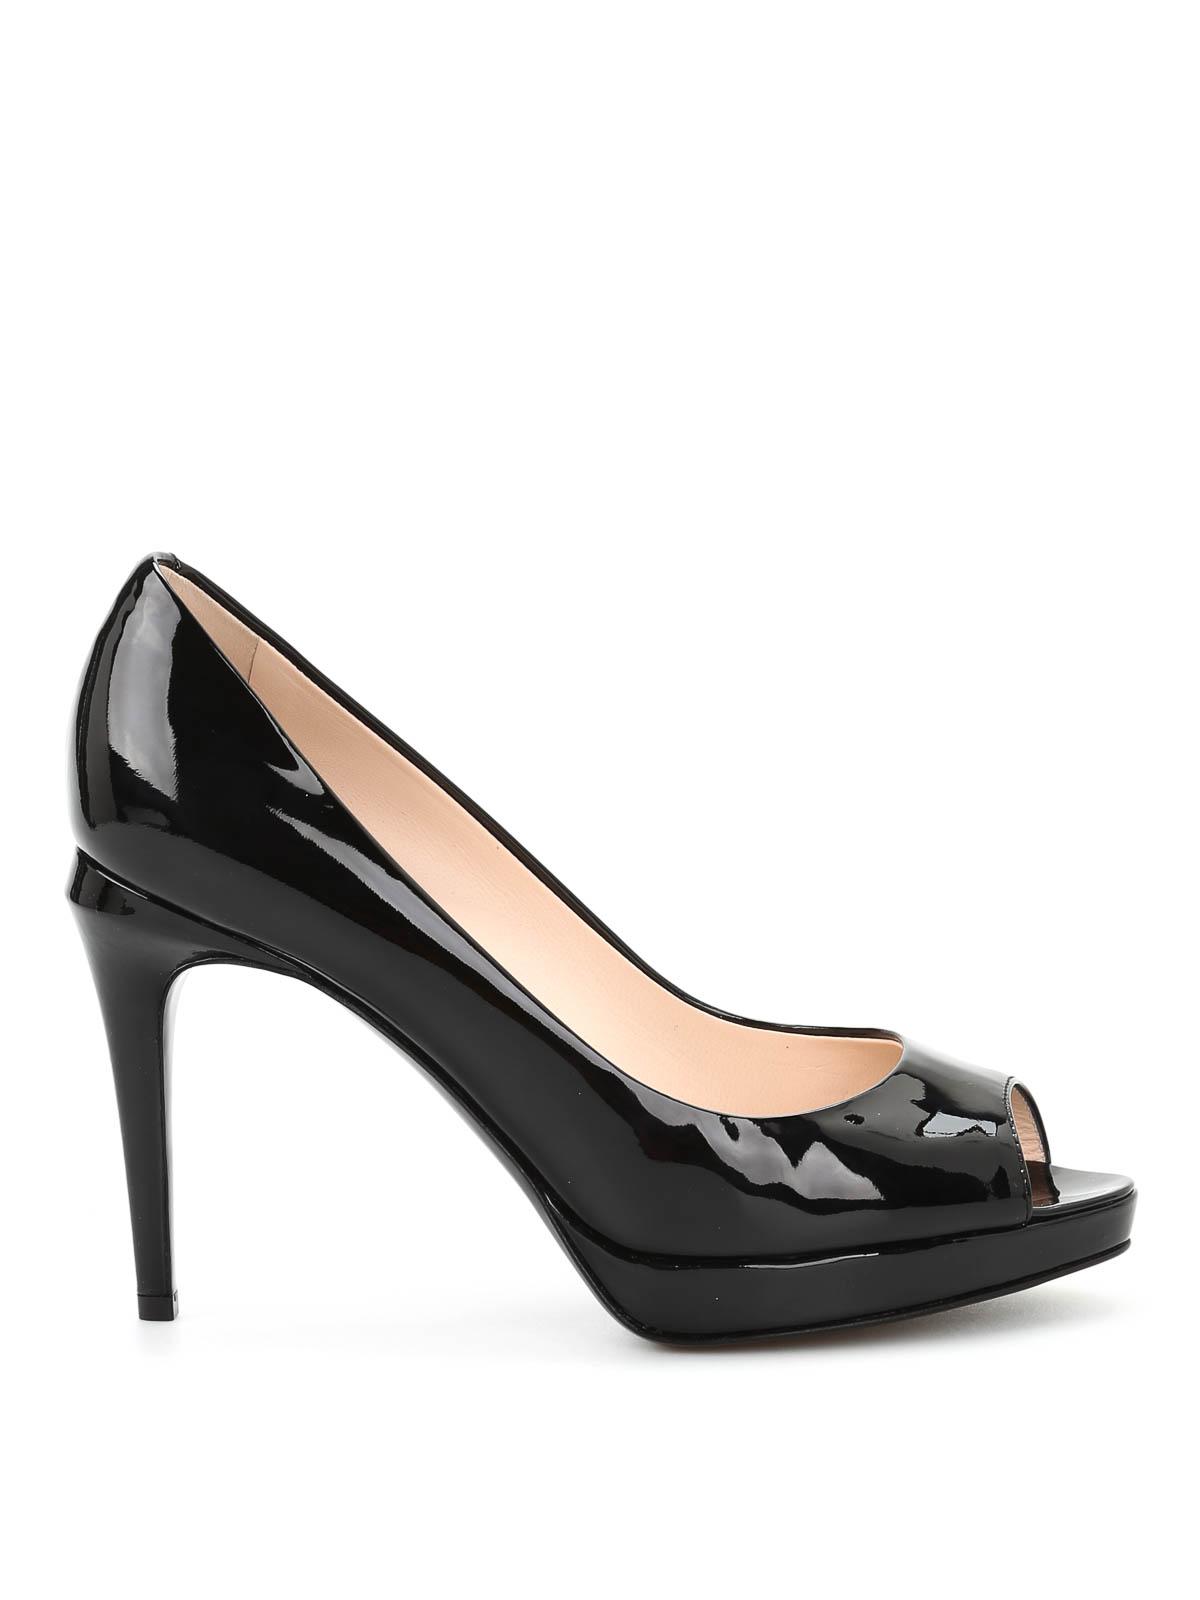 Fendi Patent Leather Court Shoes Buy Cheap Pictures KcWrYeT4m